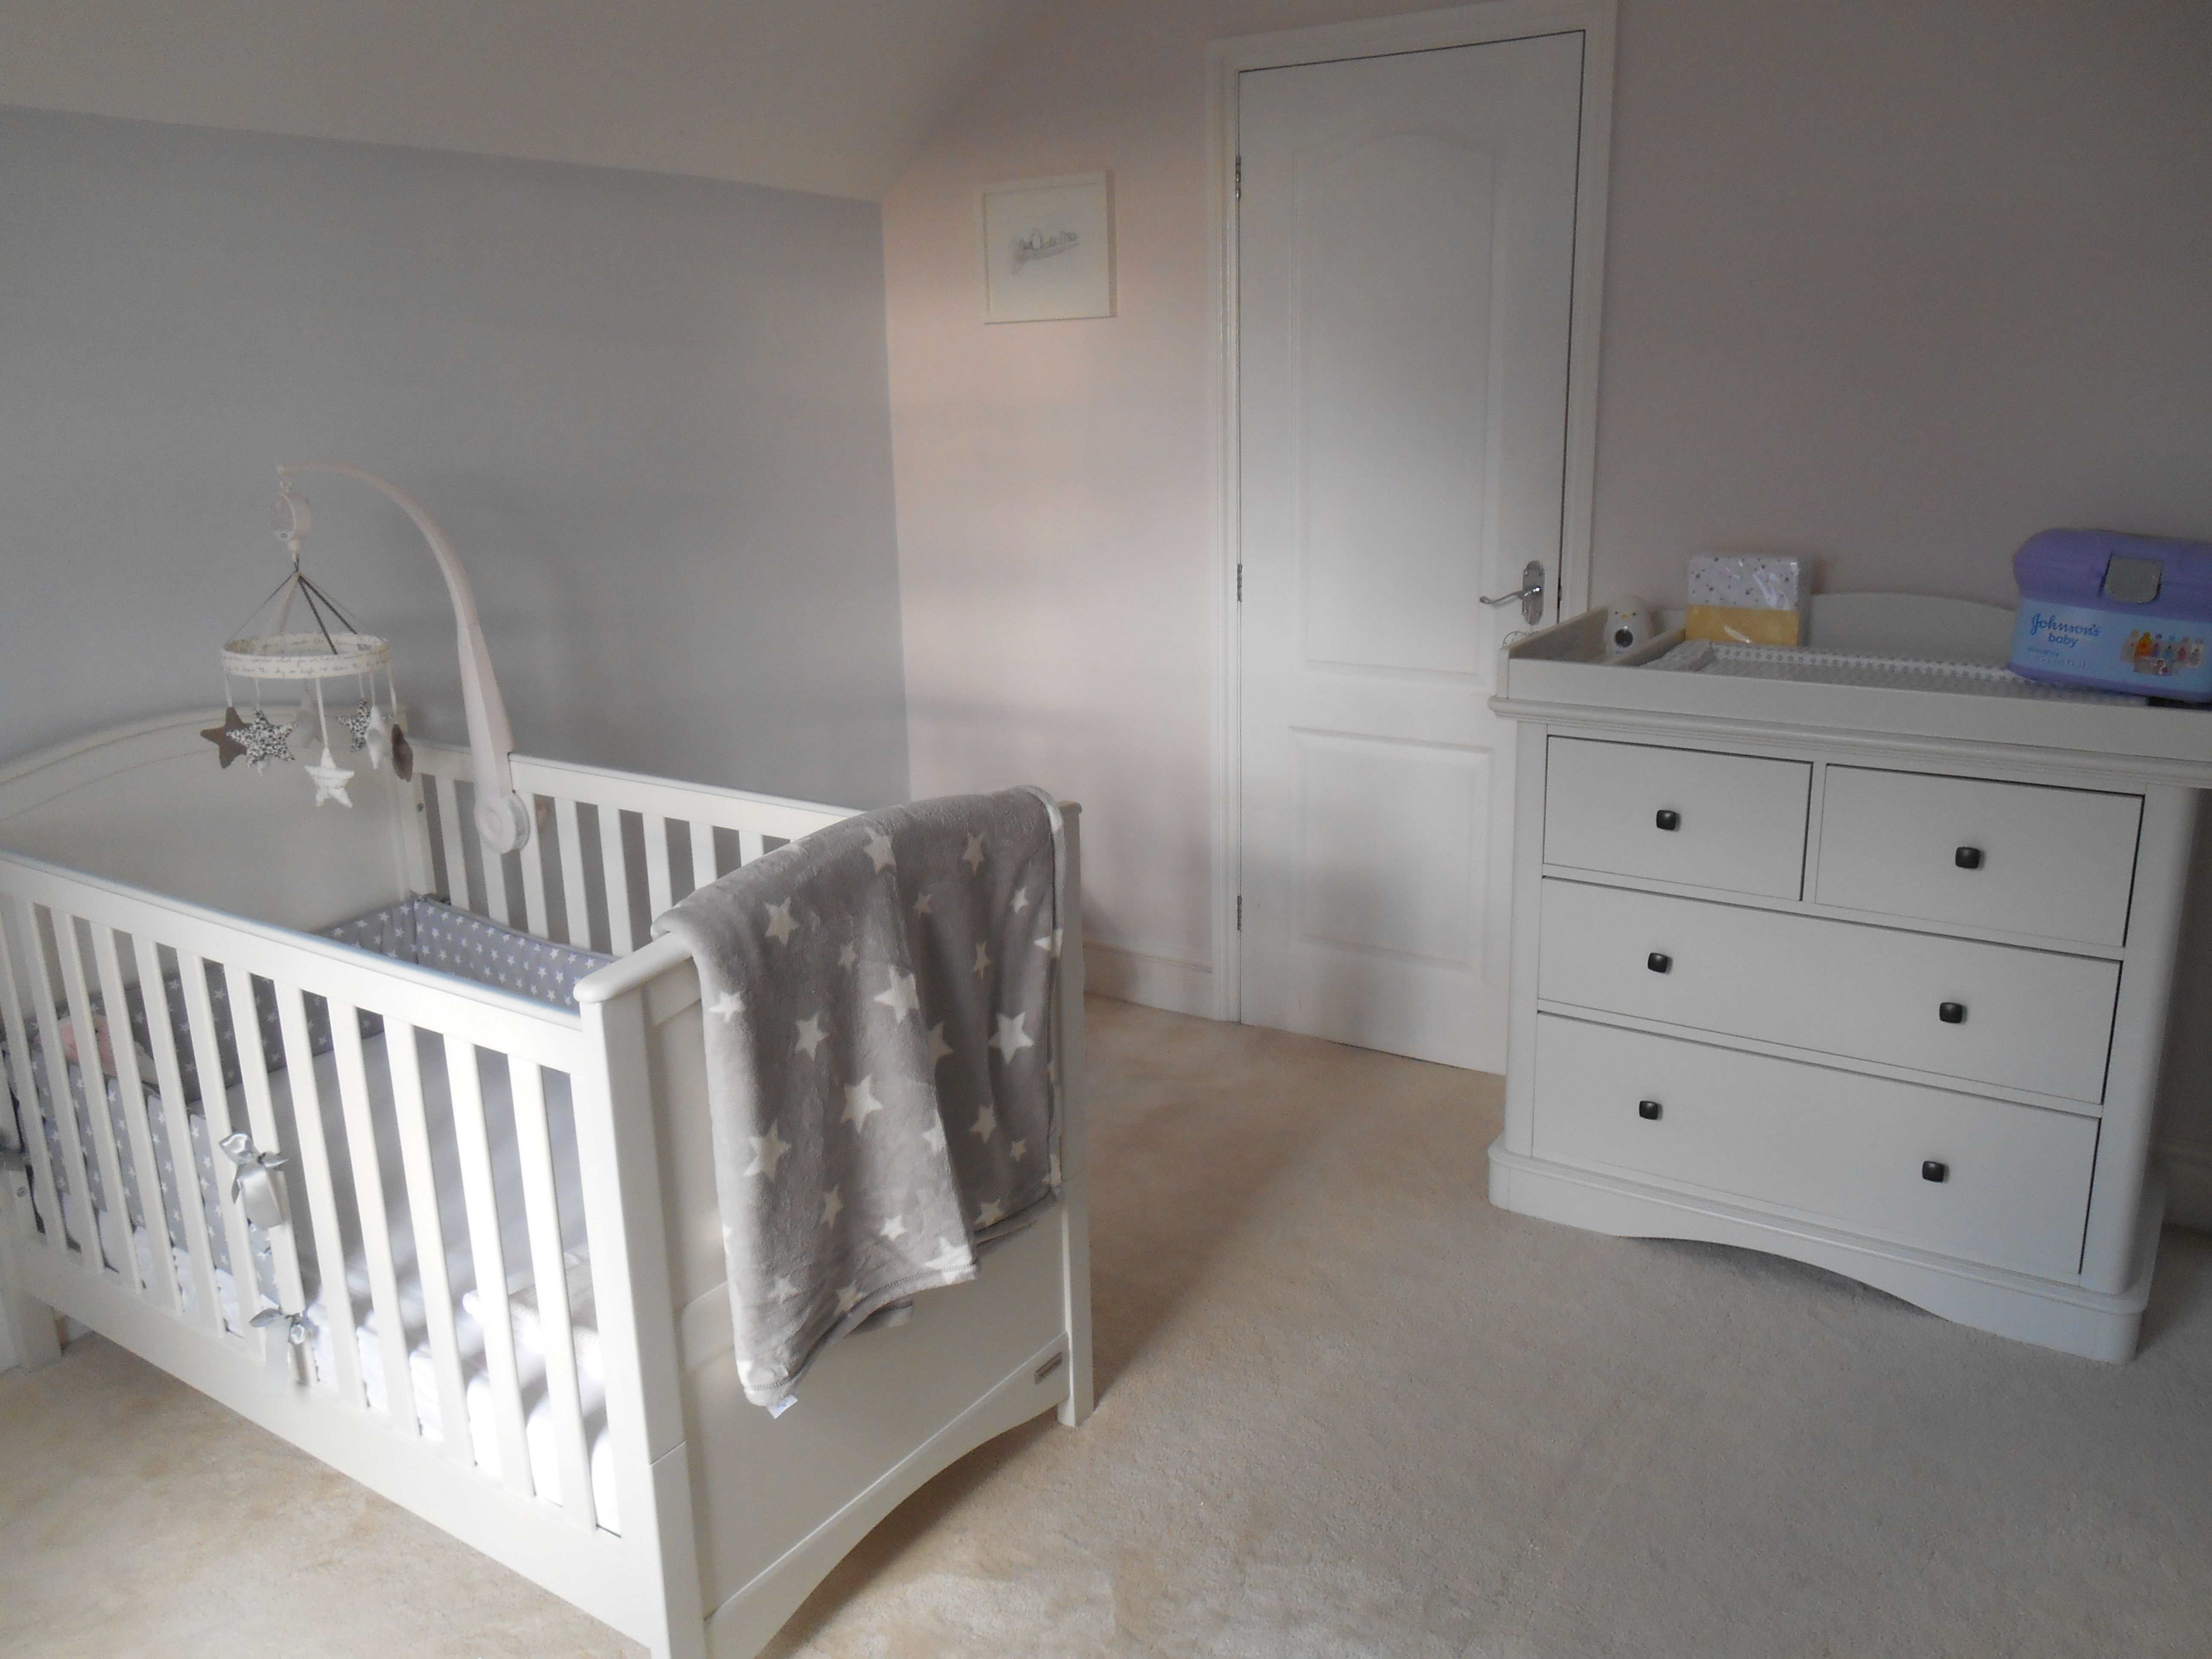 Pink & Grey Walls, Grey Star Theme, White Nursery Furniture